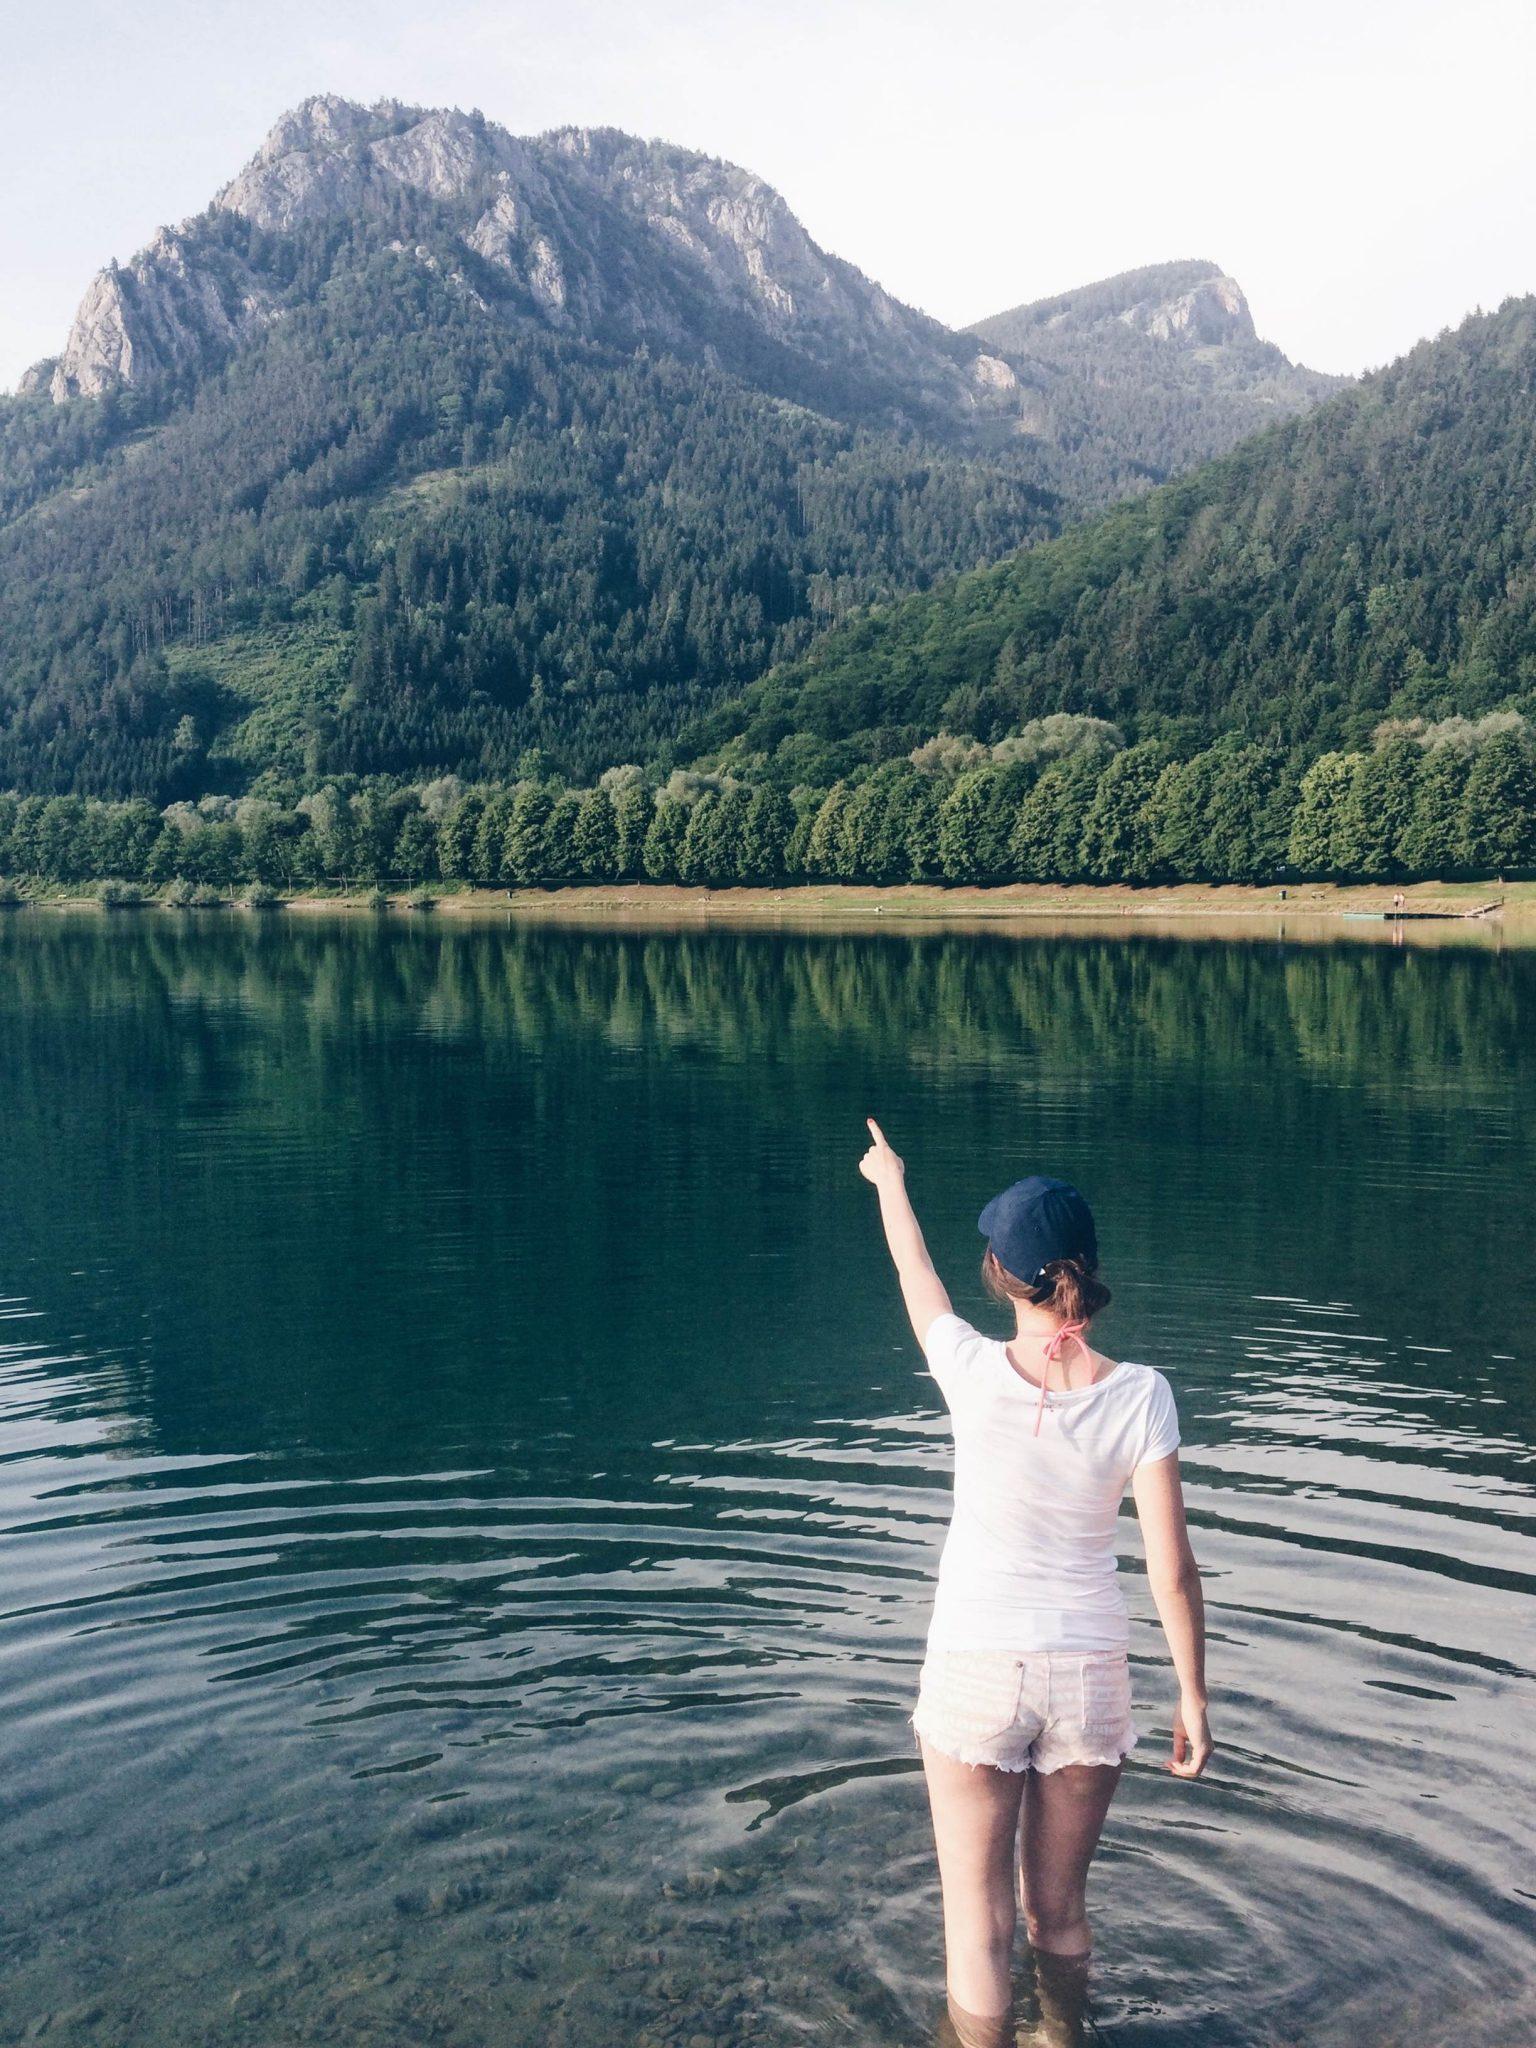 Jezioro Tiebersee w Austrii